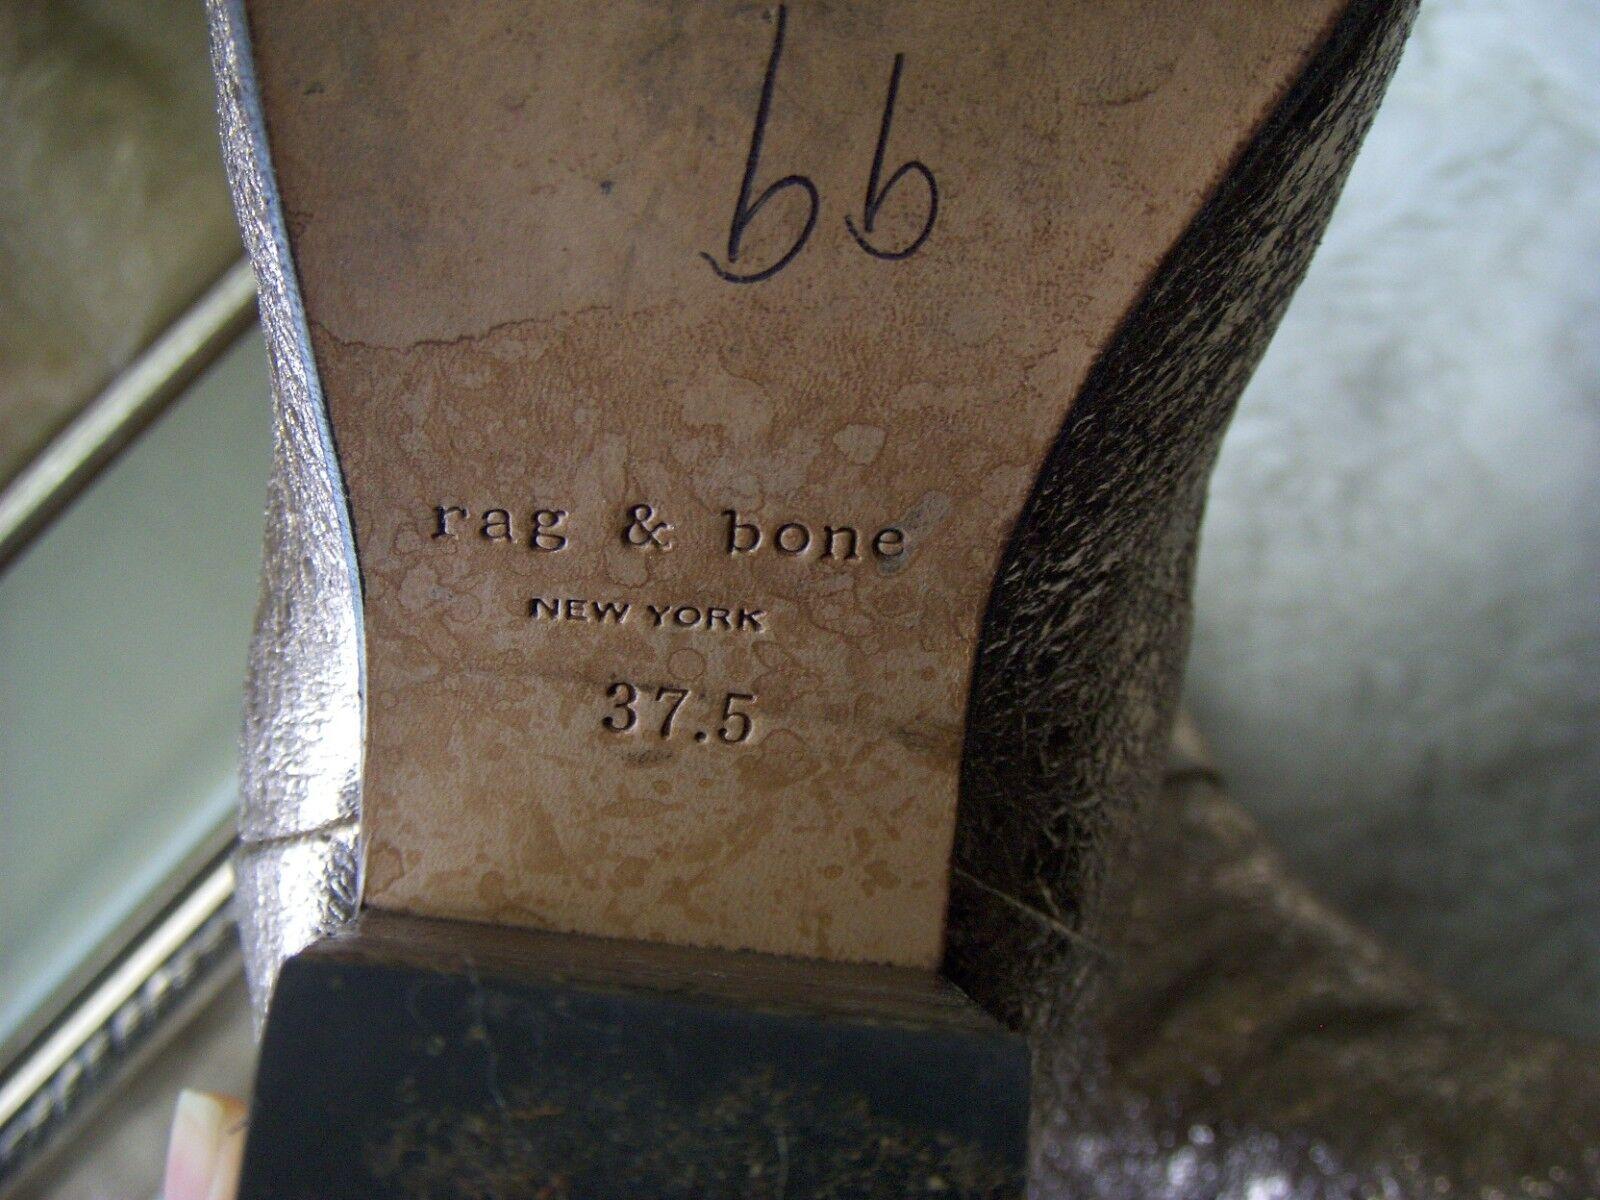 Rag & Bone Newbury Leather bottes bottes bottes démarrageies Taille 37.5 Wow 488840